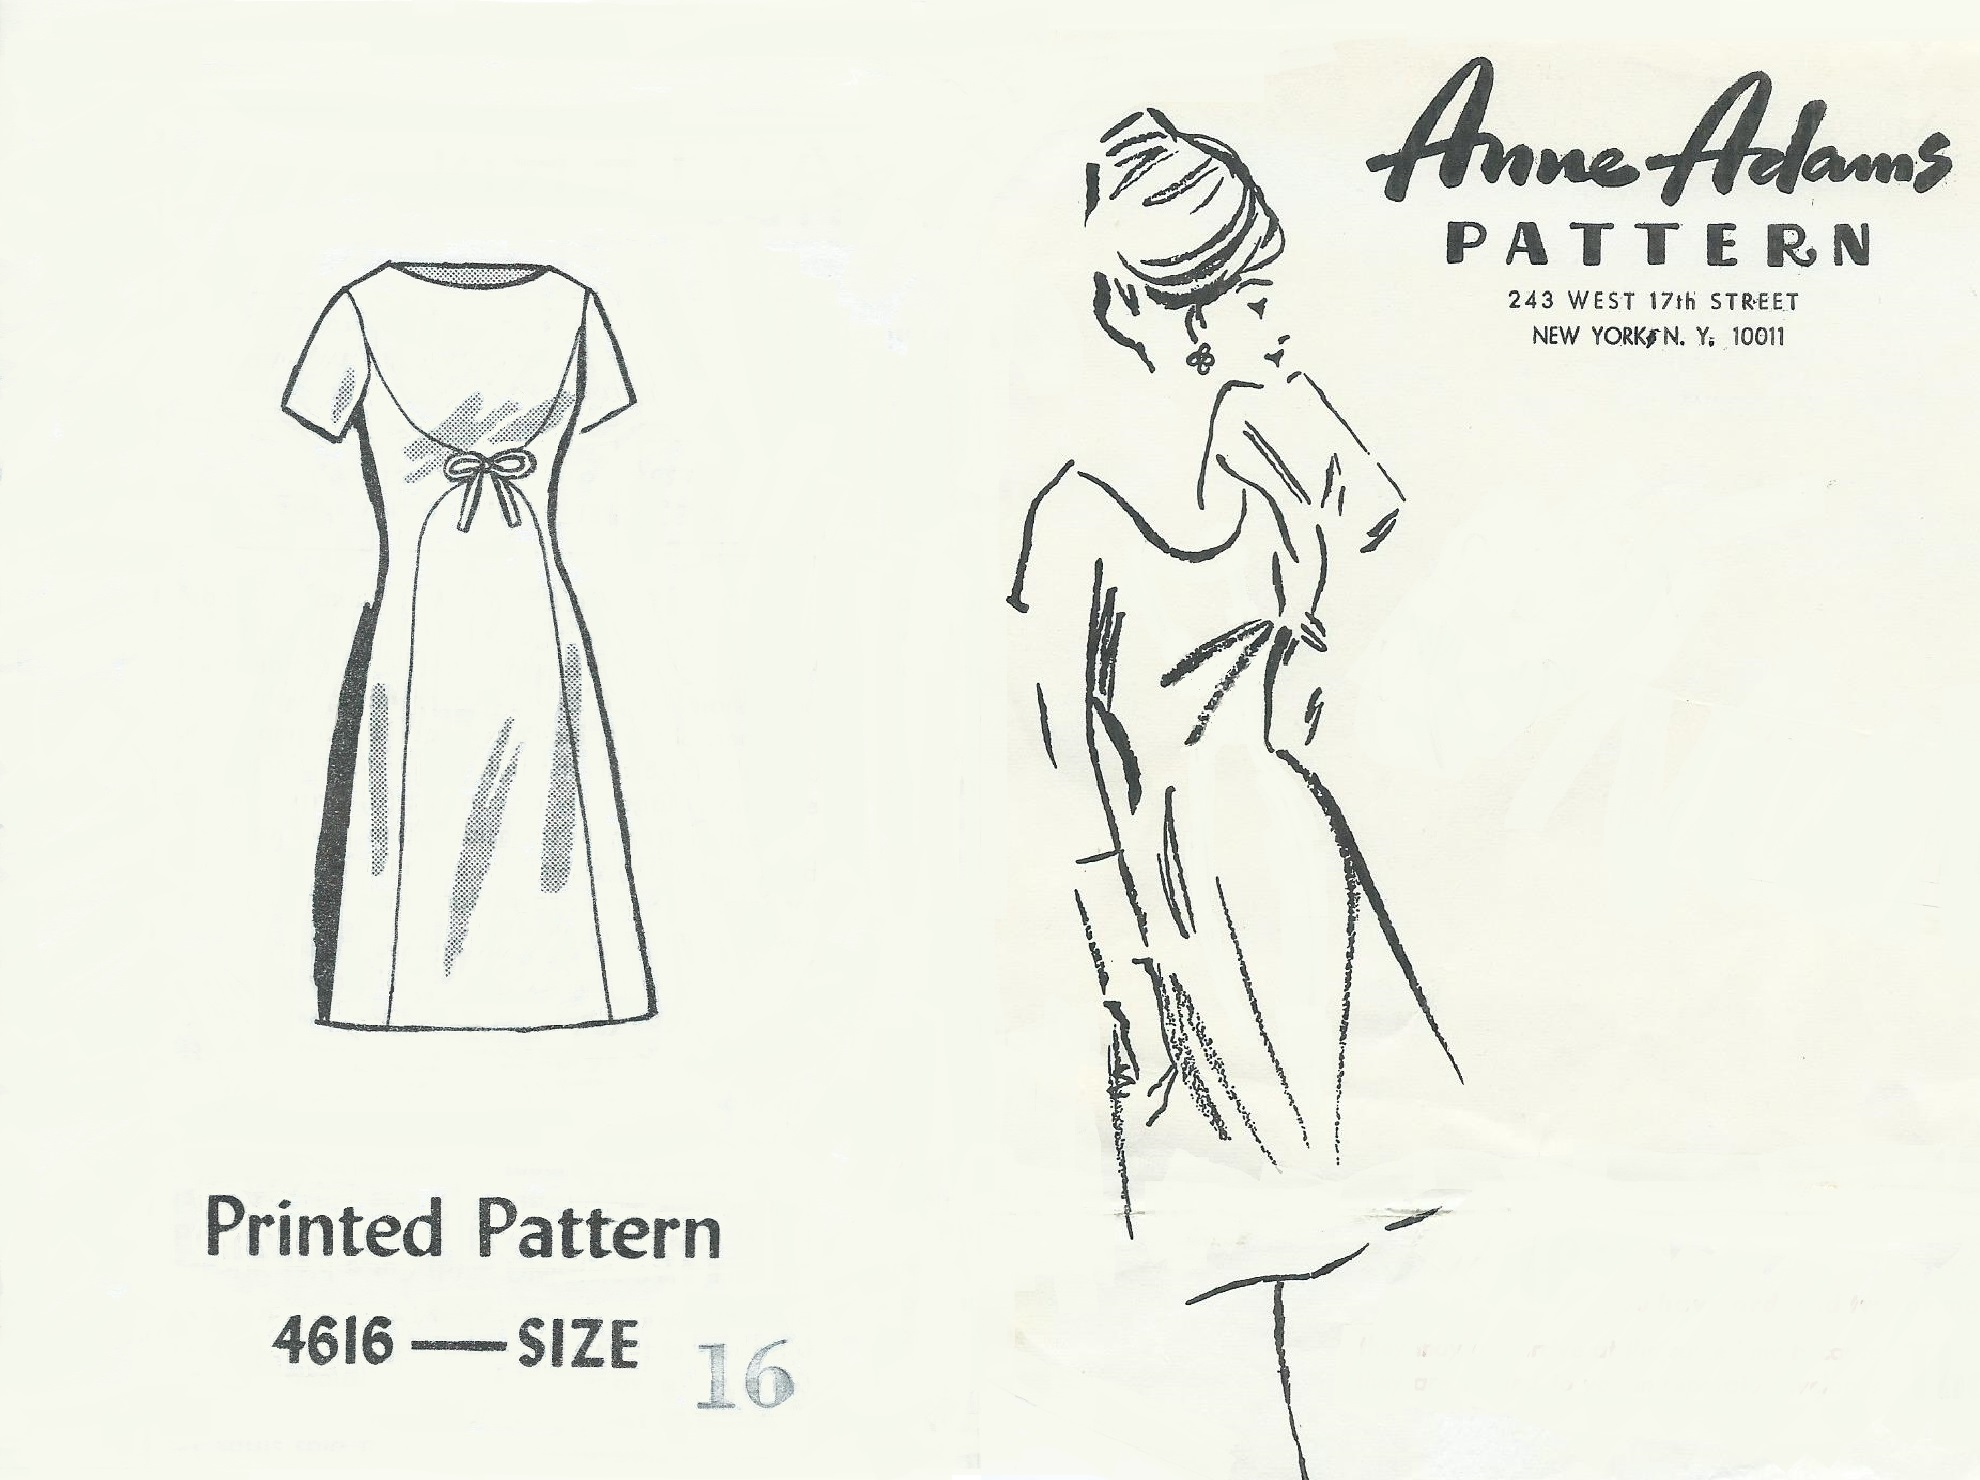 Anne Adams 4616 C